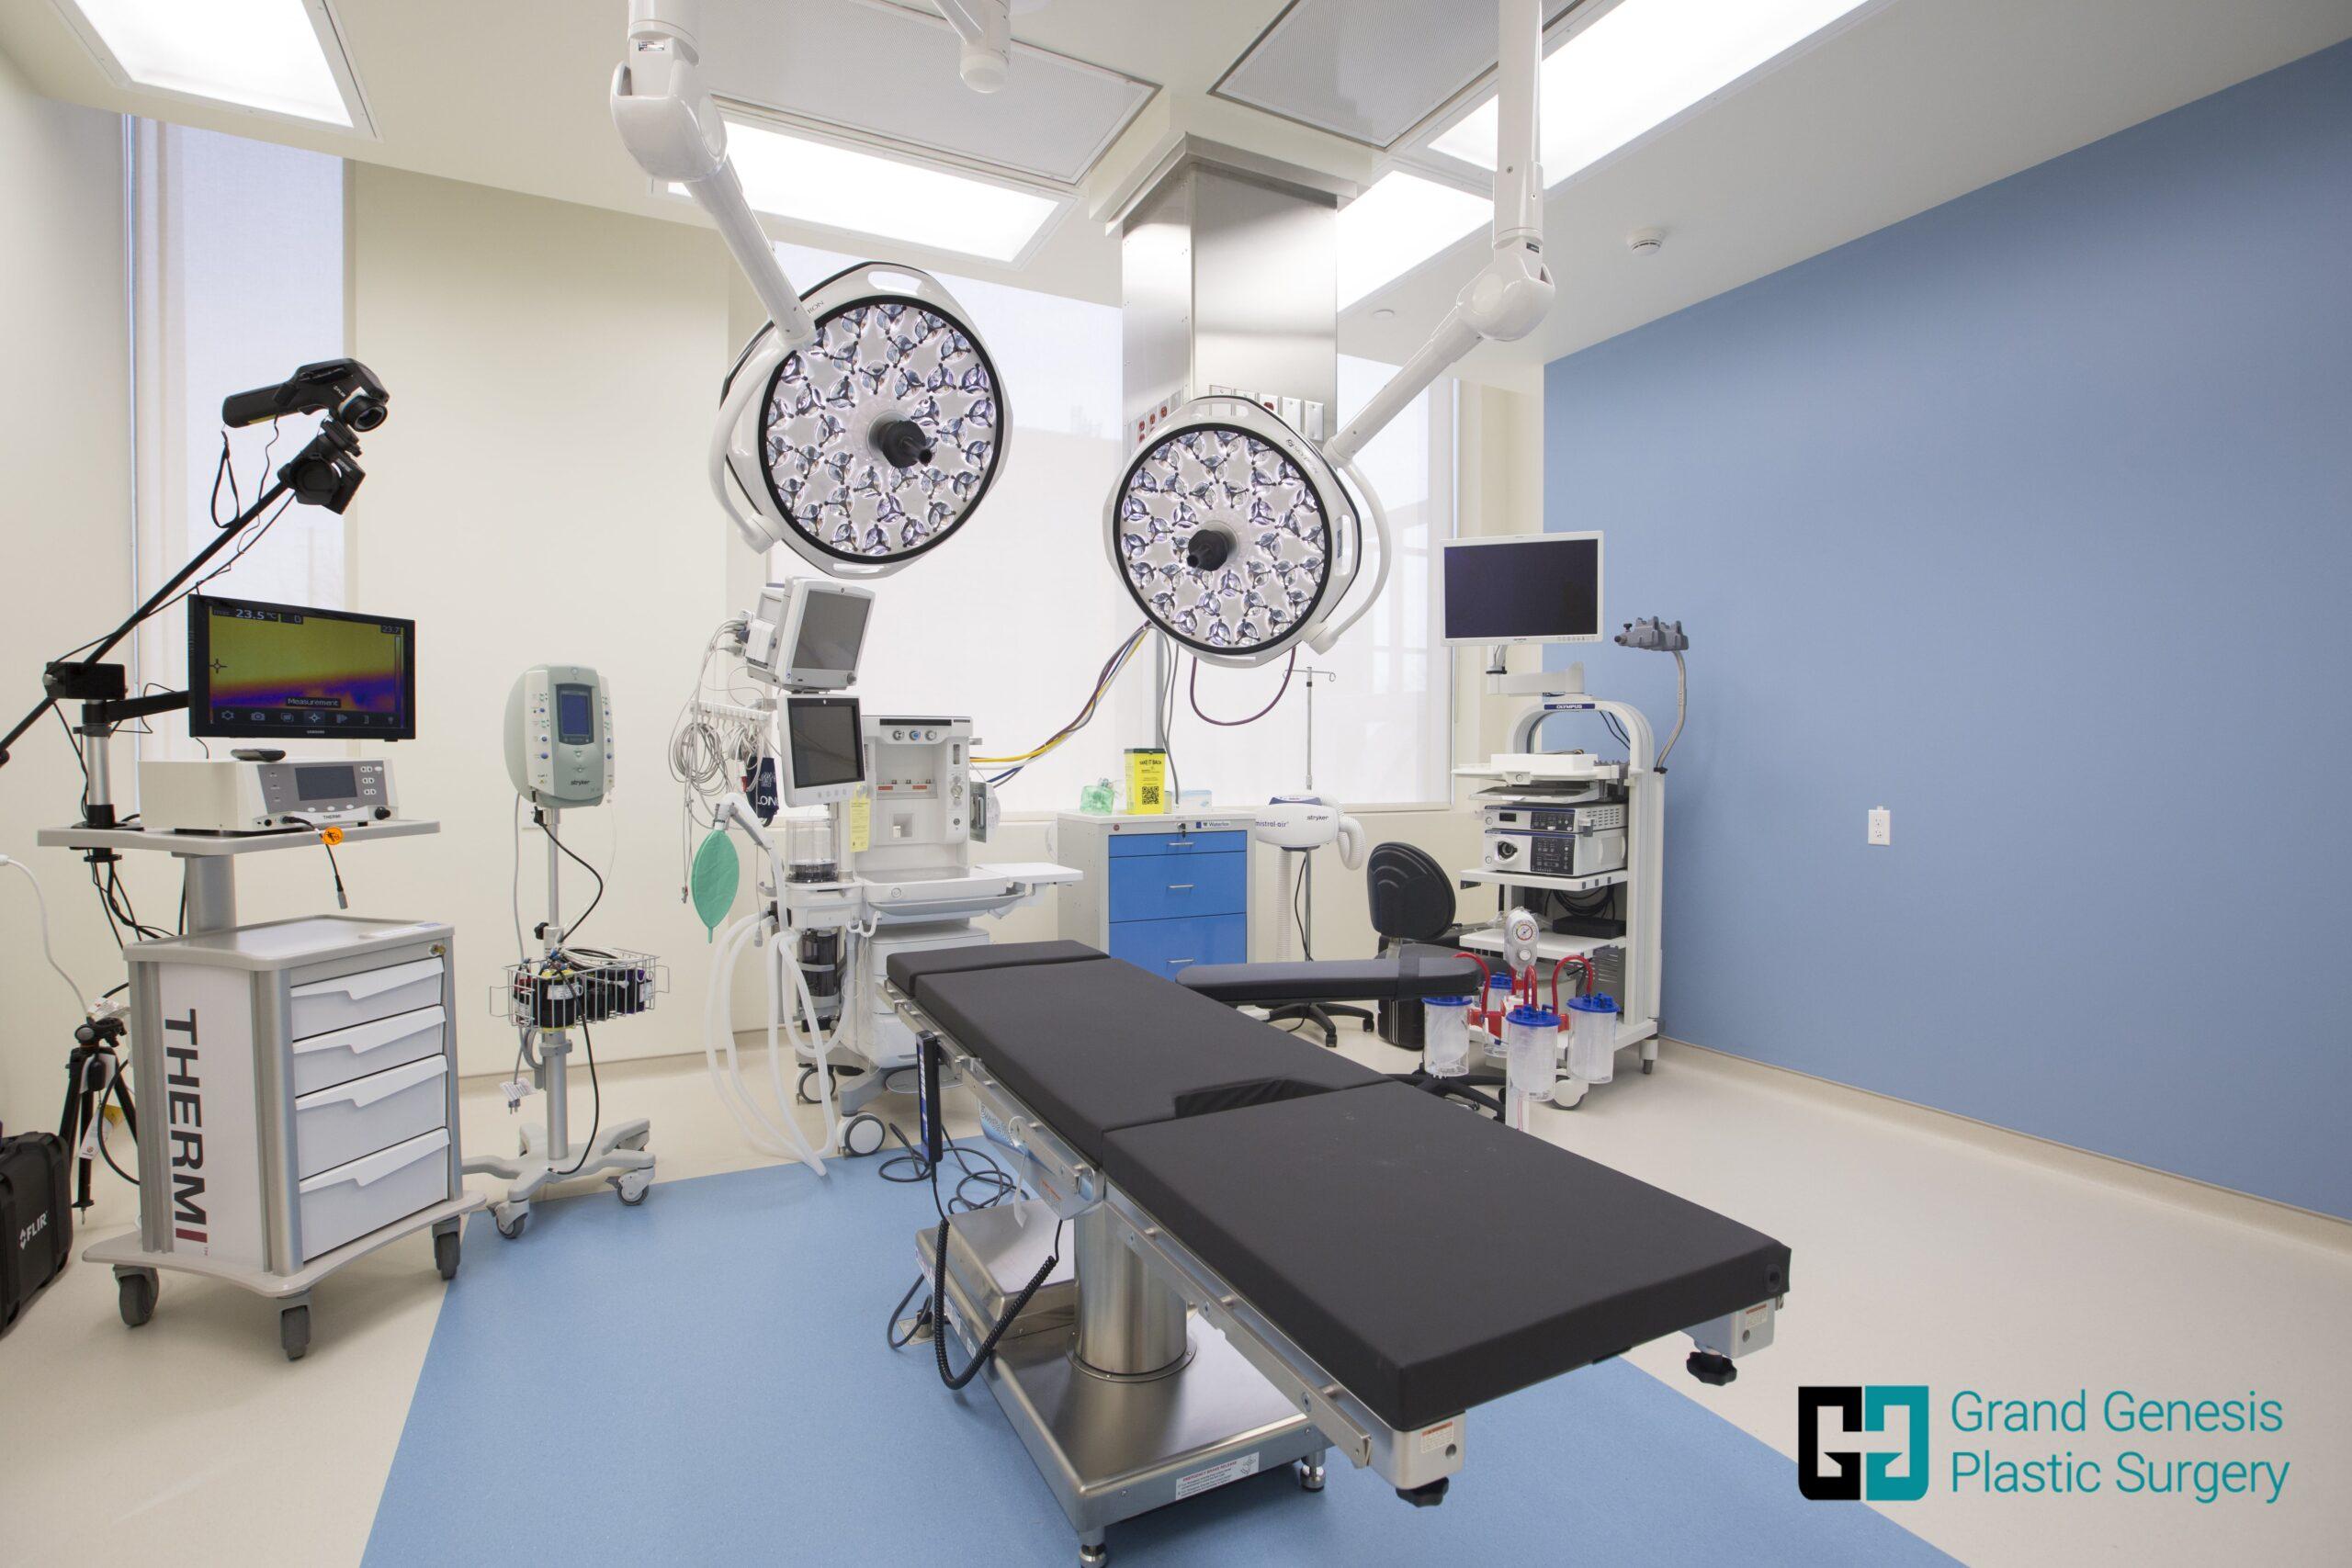 Grand Genesis plastic surgery operating room